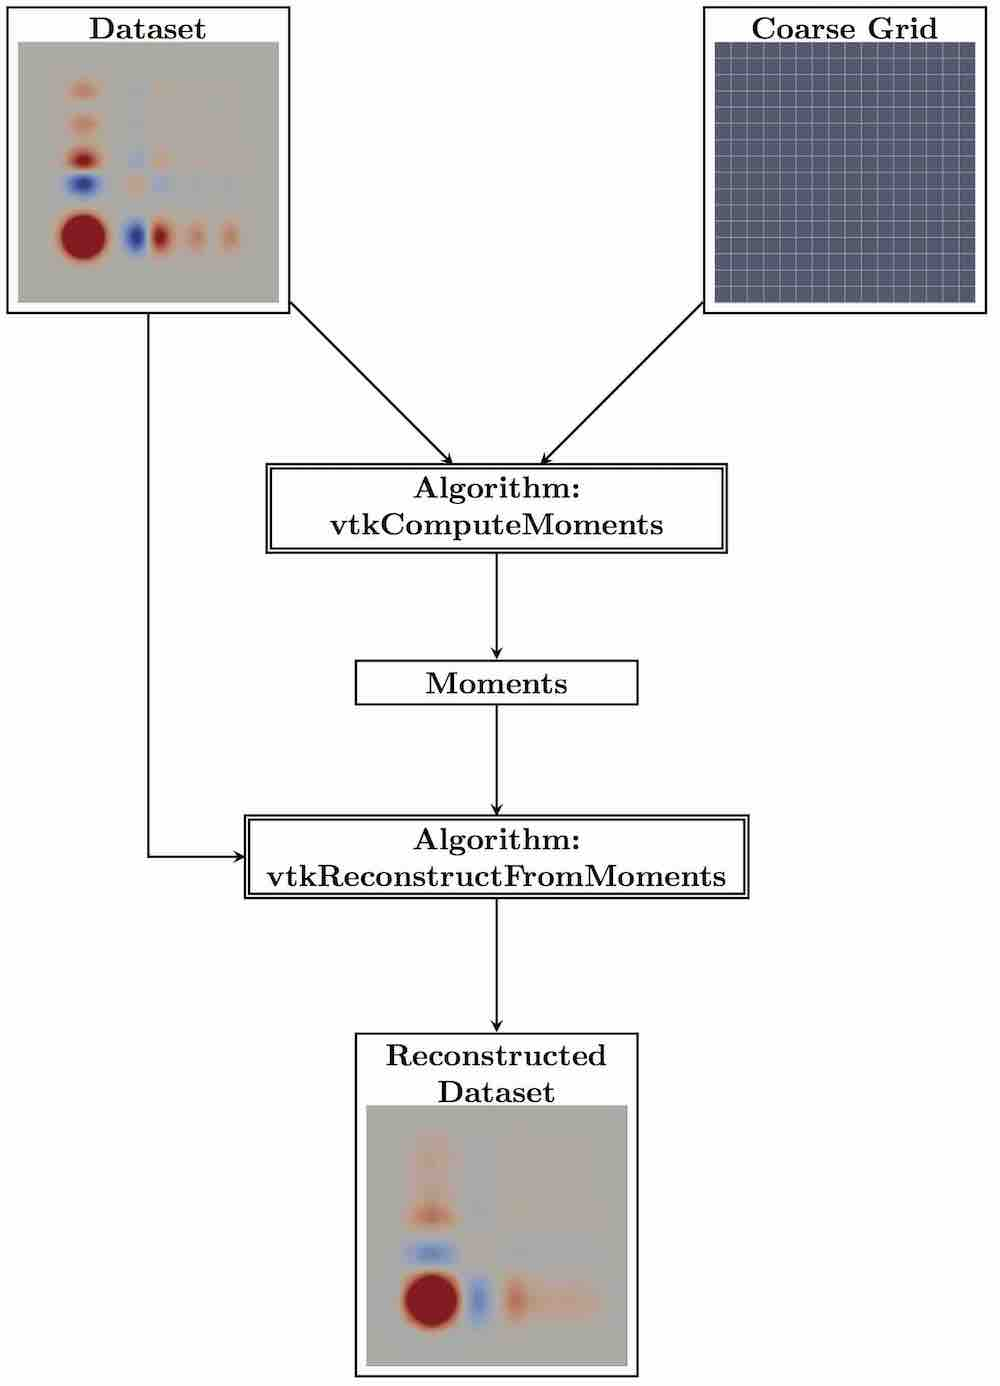 Documentation/Doxygen/chartReconstructField.jpg